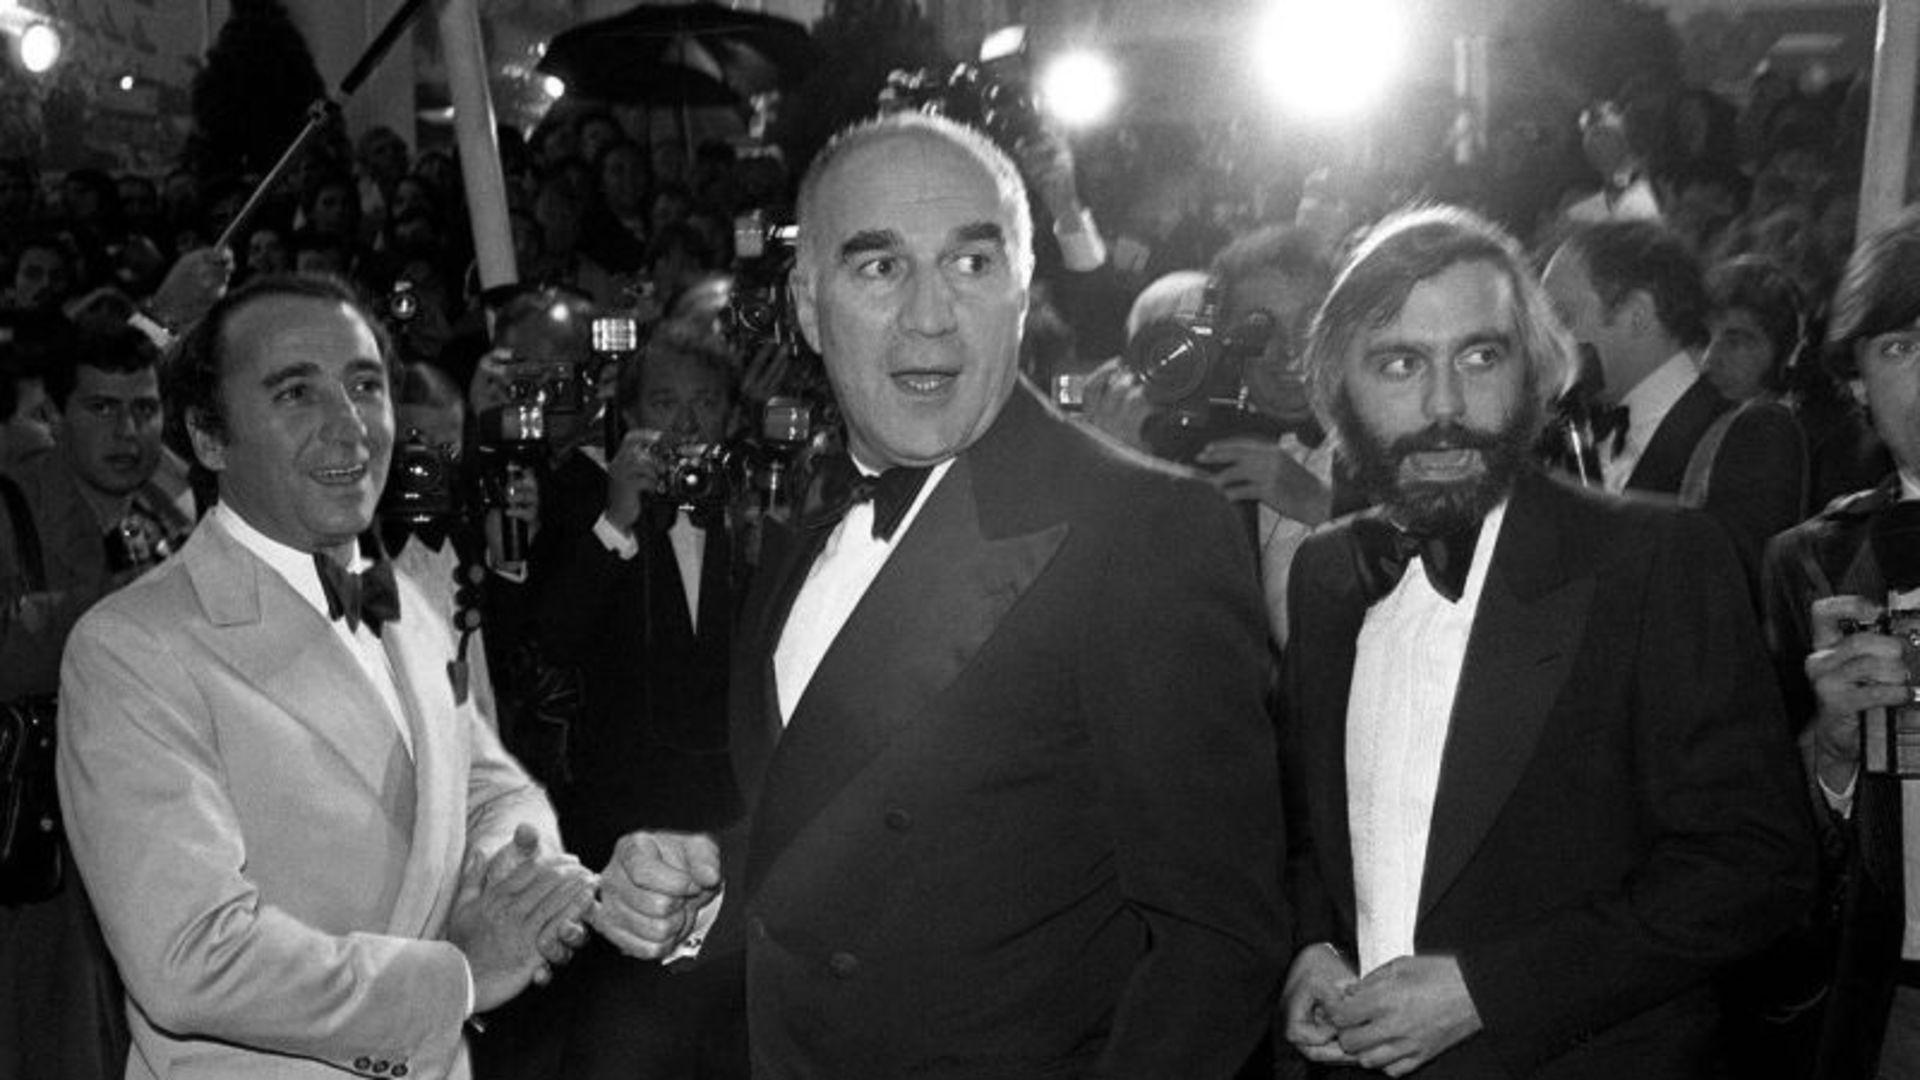 Frans filmicoon Michel Piccoli (94) overleden